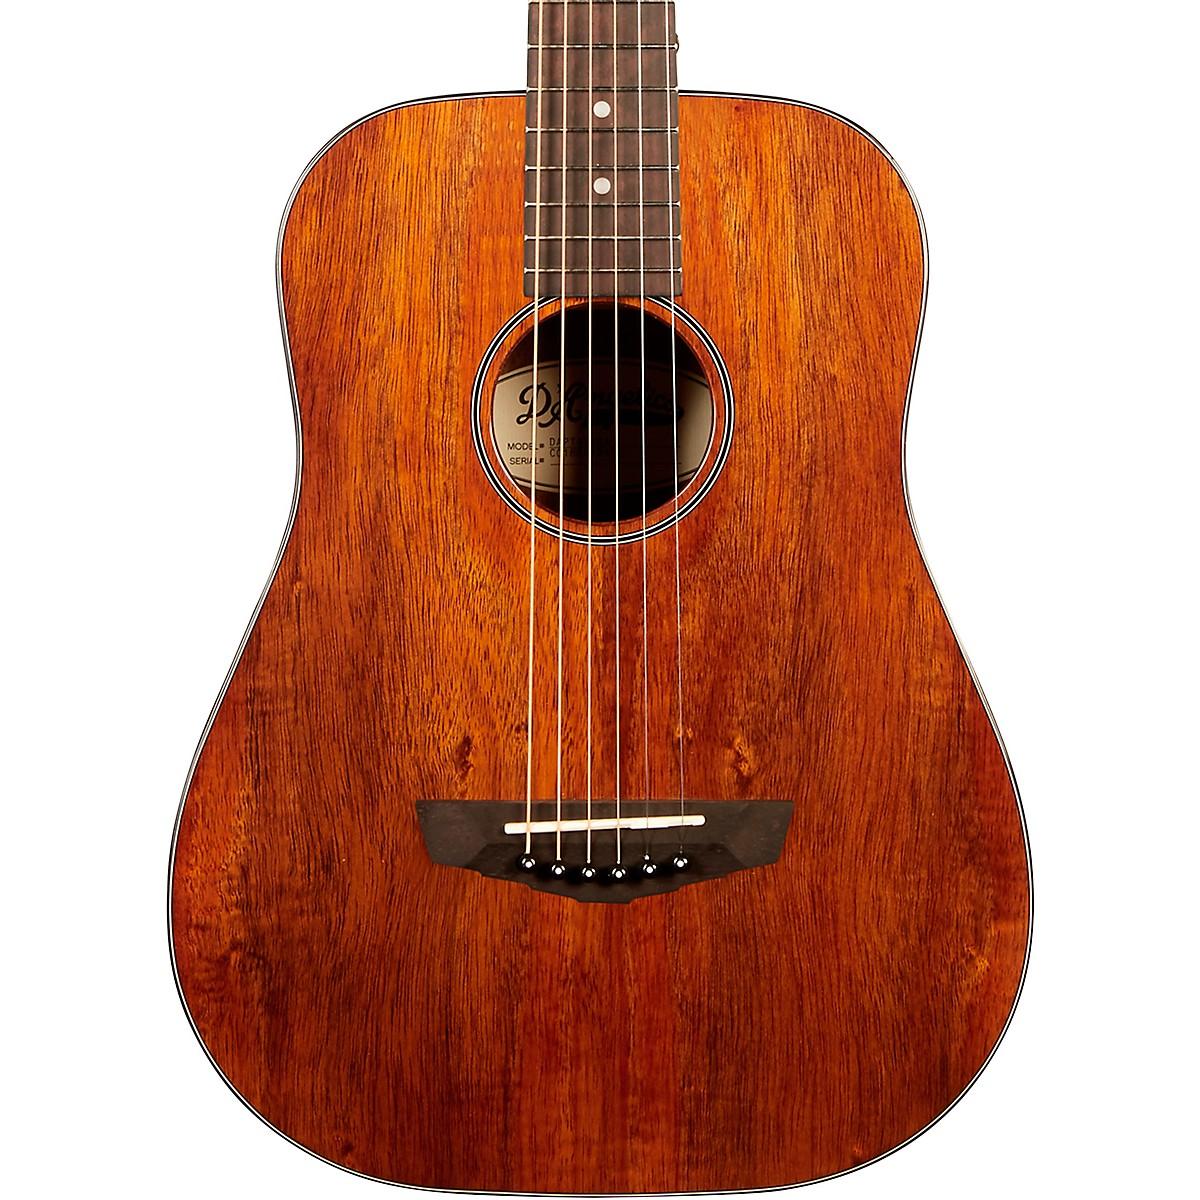 D'Angelico Premier Utica Koa Mini Acoustic Guitar